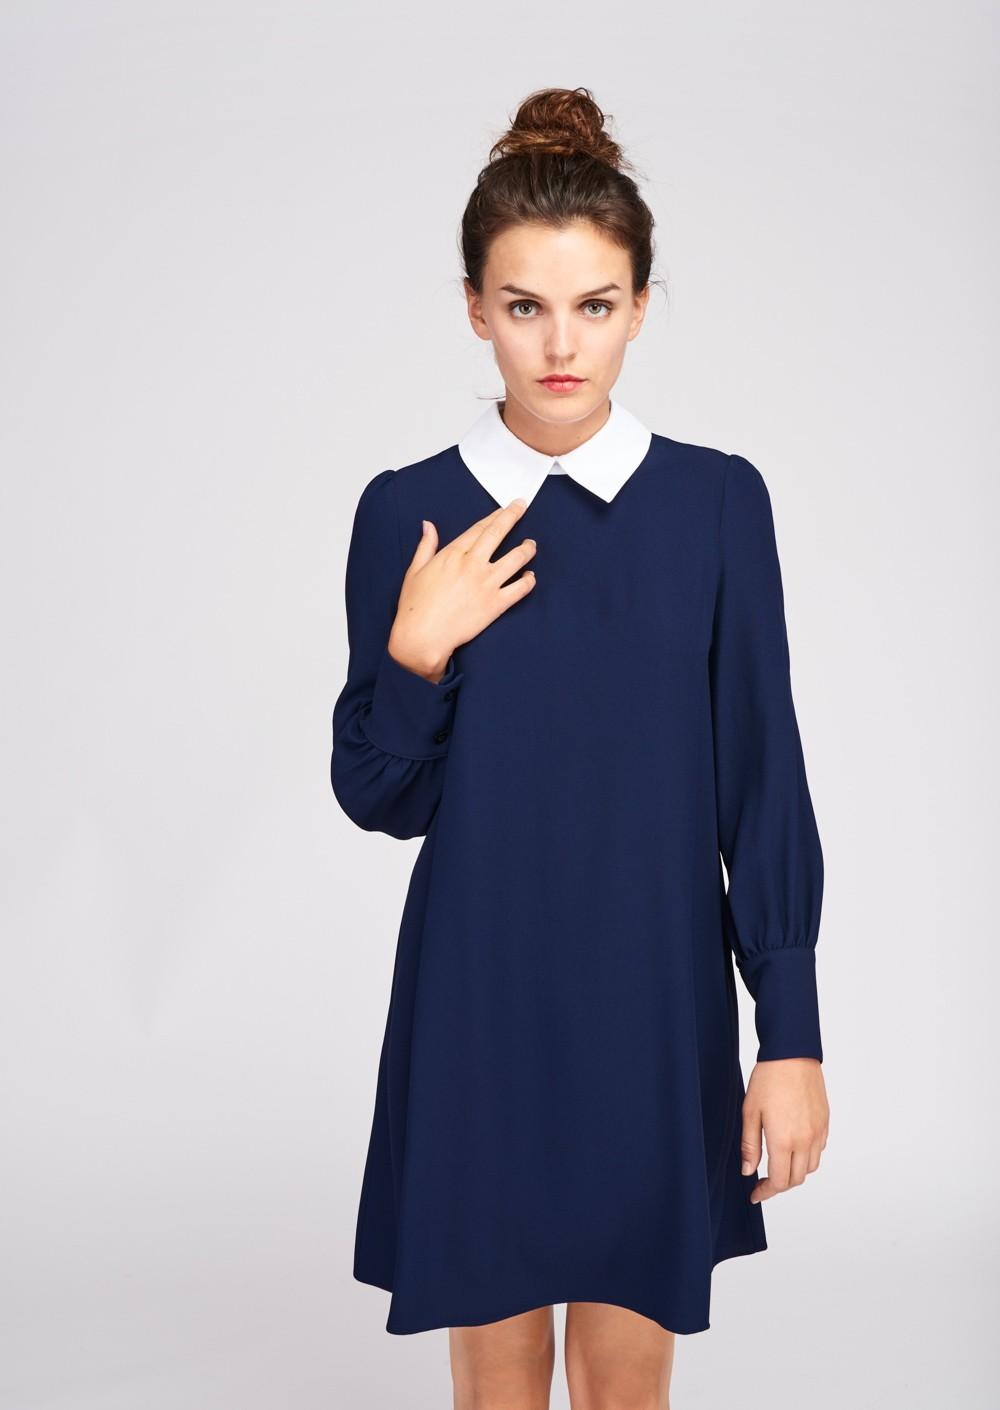 Robe bleu marine col claudine